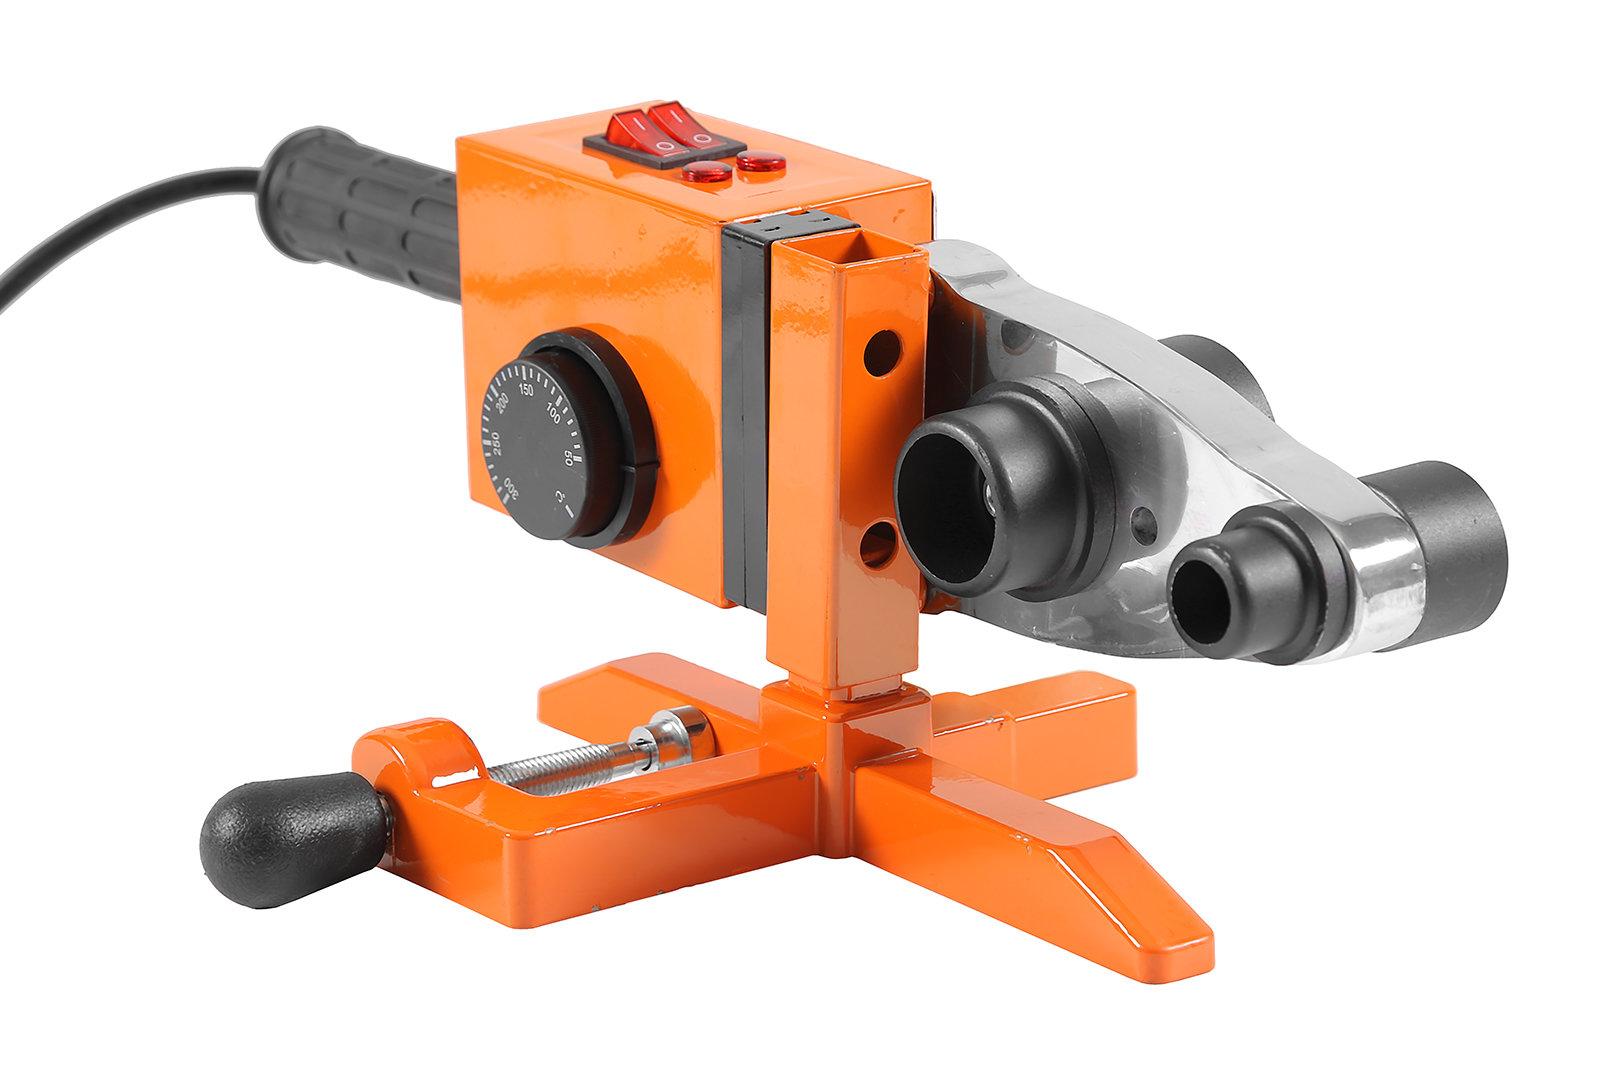 Аппарат для сварки пластиковых труб Wester Dwm 1500